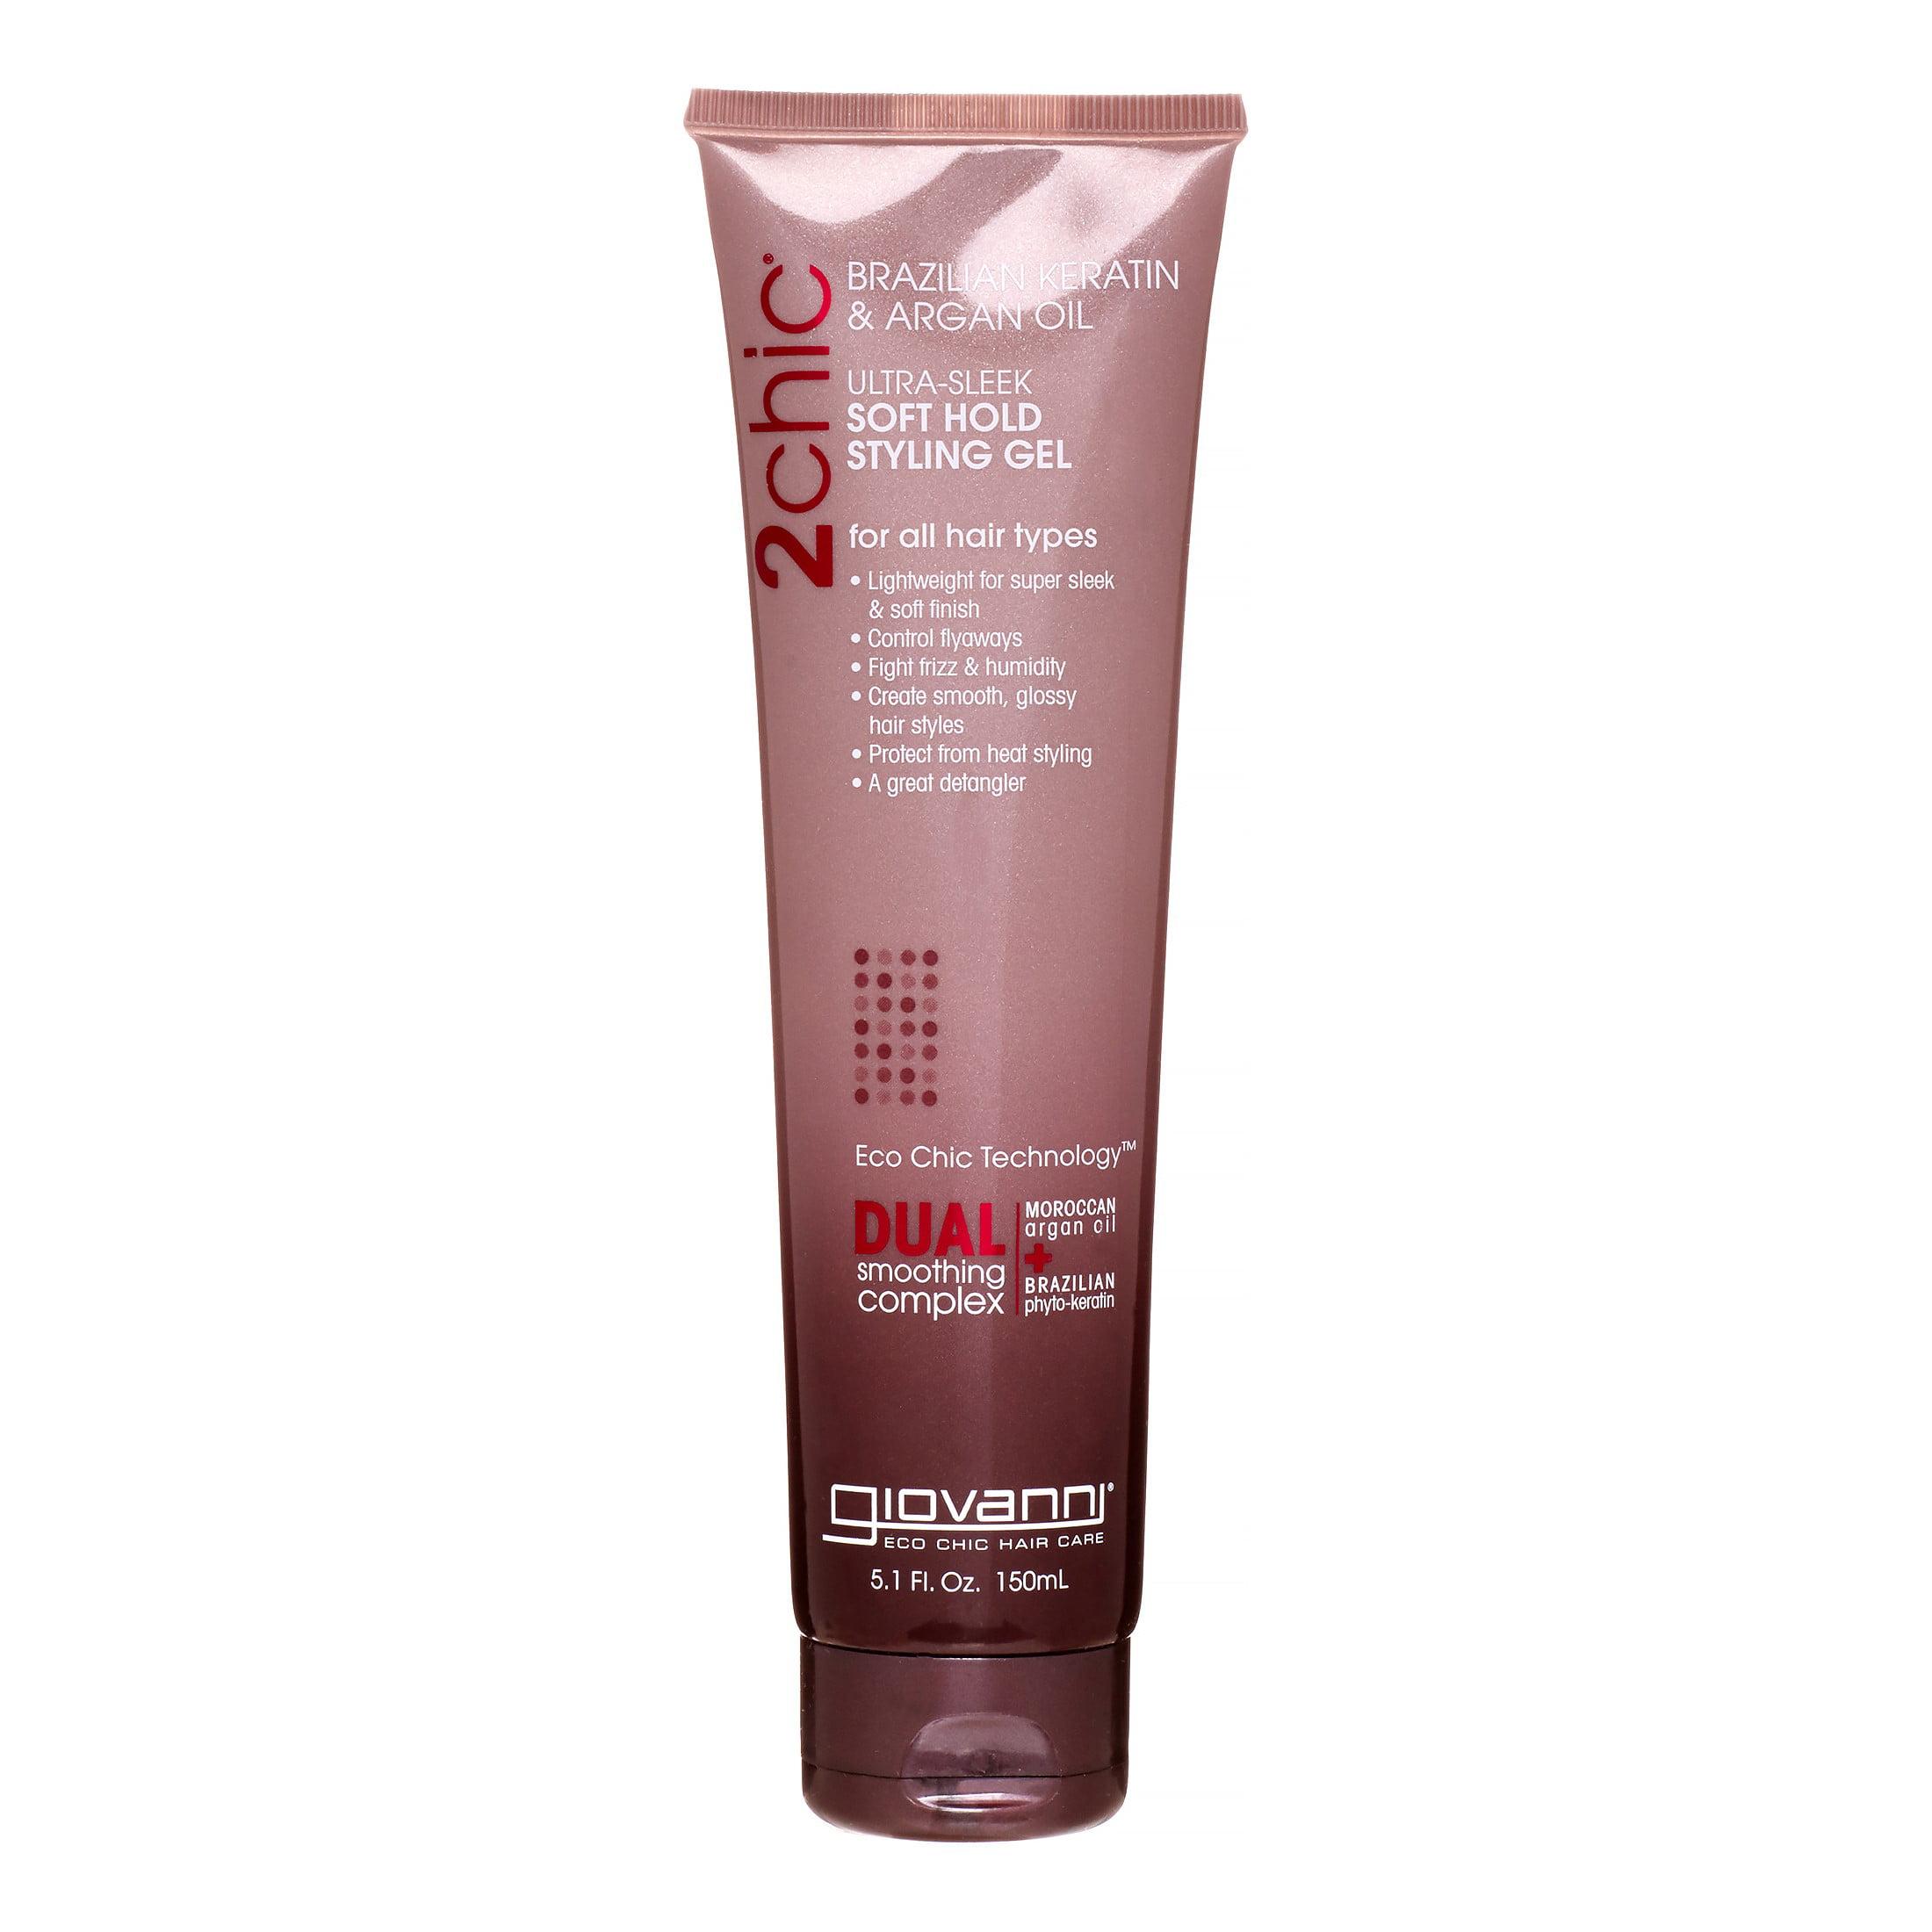 Giovanni 2chic Ultra-Sleek Soft Hold Styling Gel, Brazilian Keratin & Argan Oil, 5.1 Oz